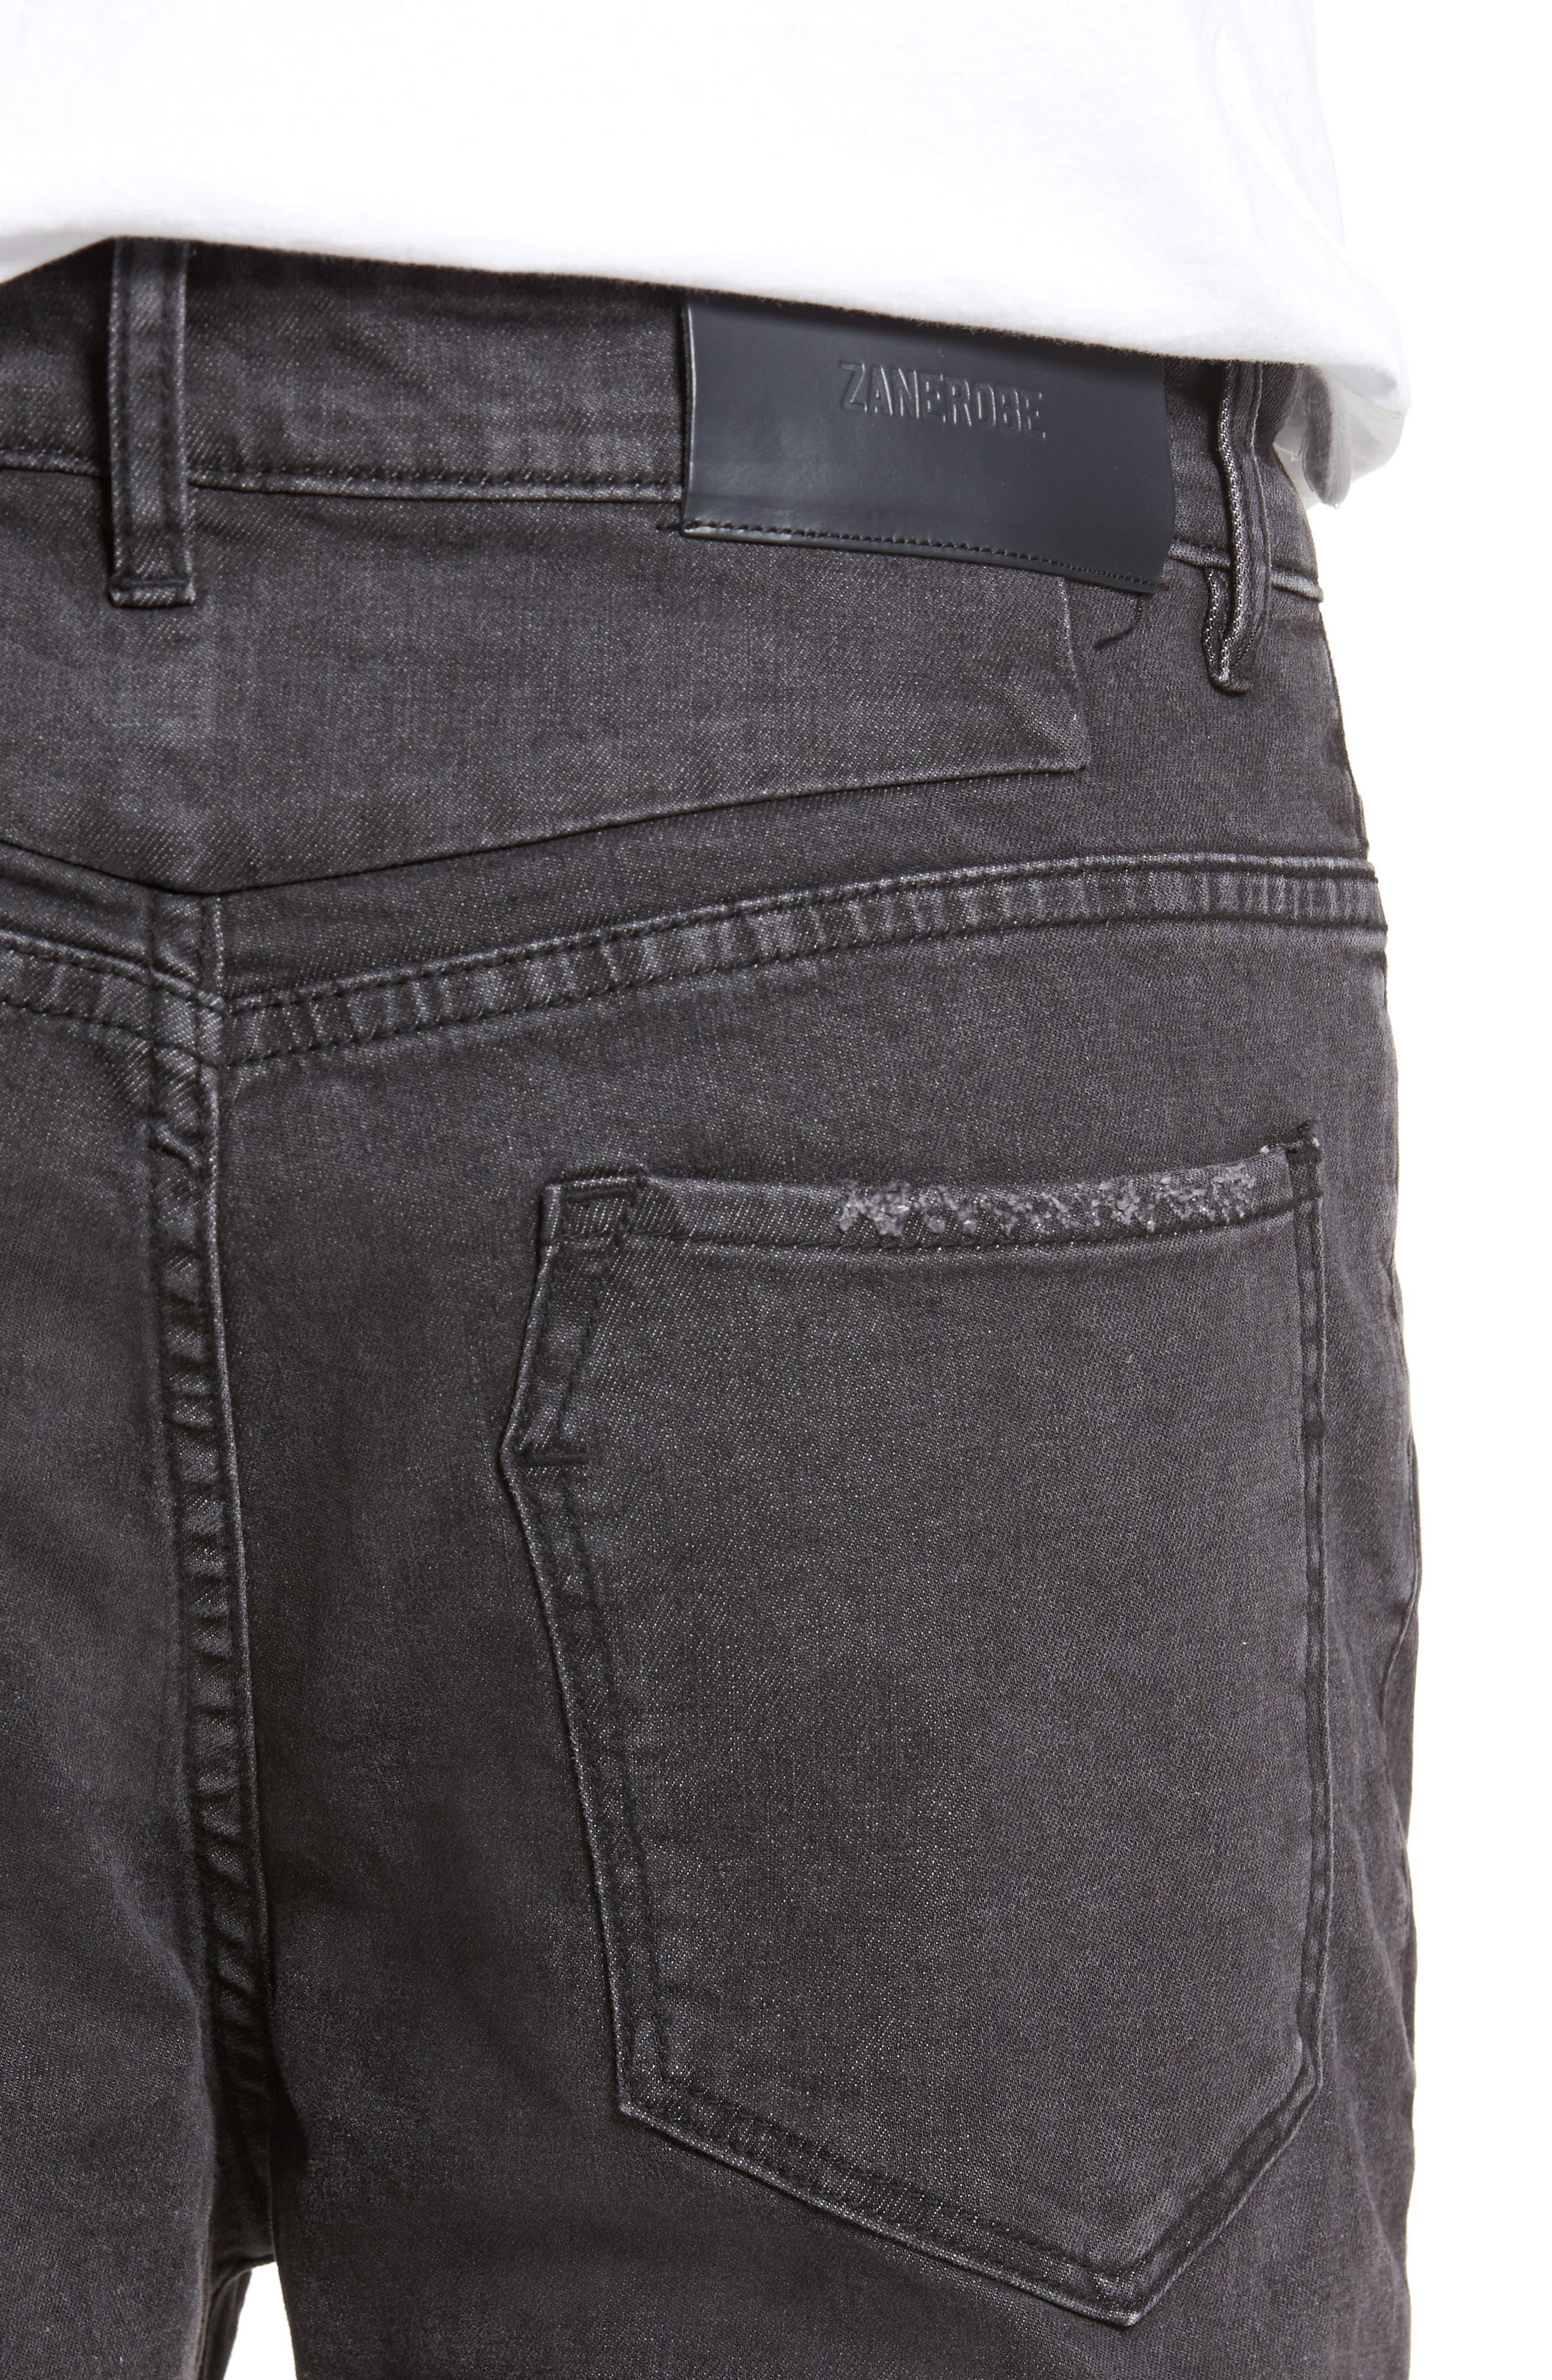 Joe Blow Destroyed Denim Jeans,                             Alternate thumbnail 4, color,                             BLACK